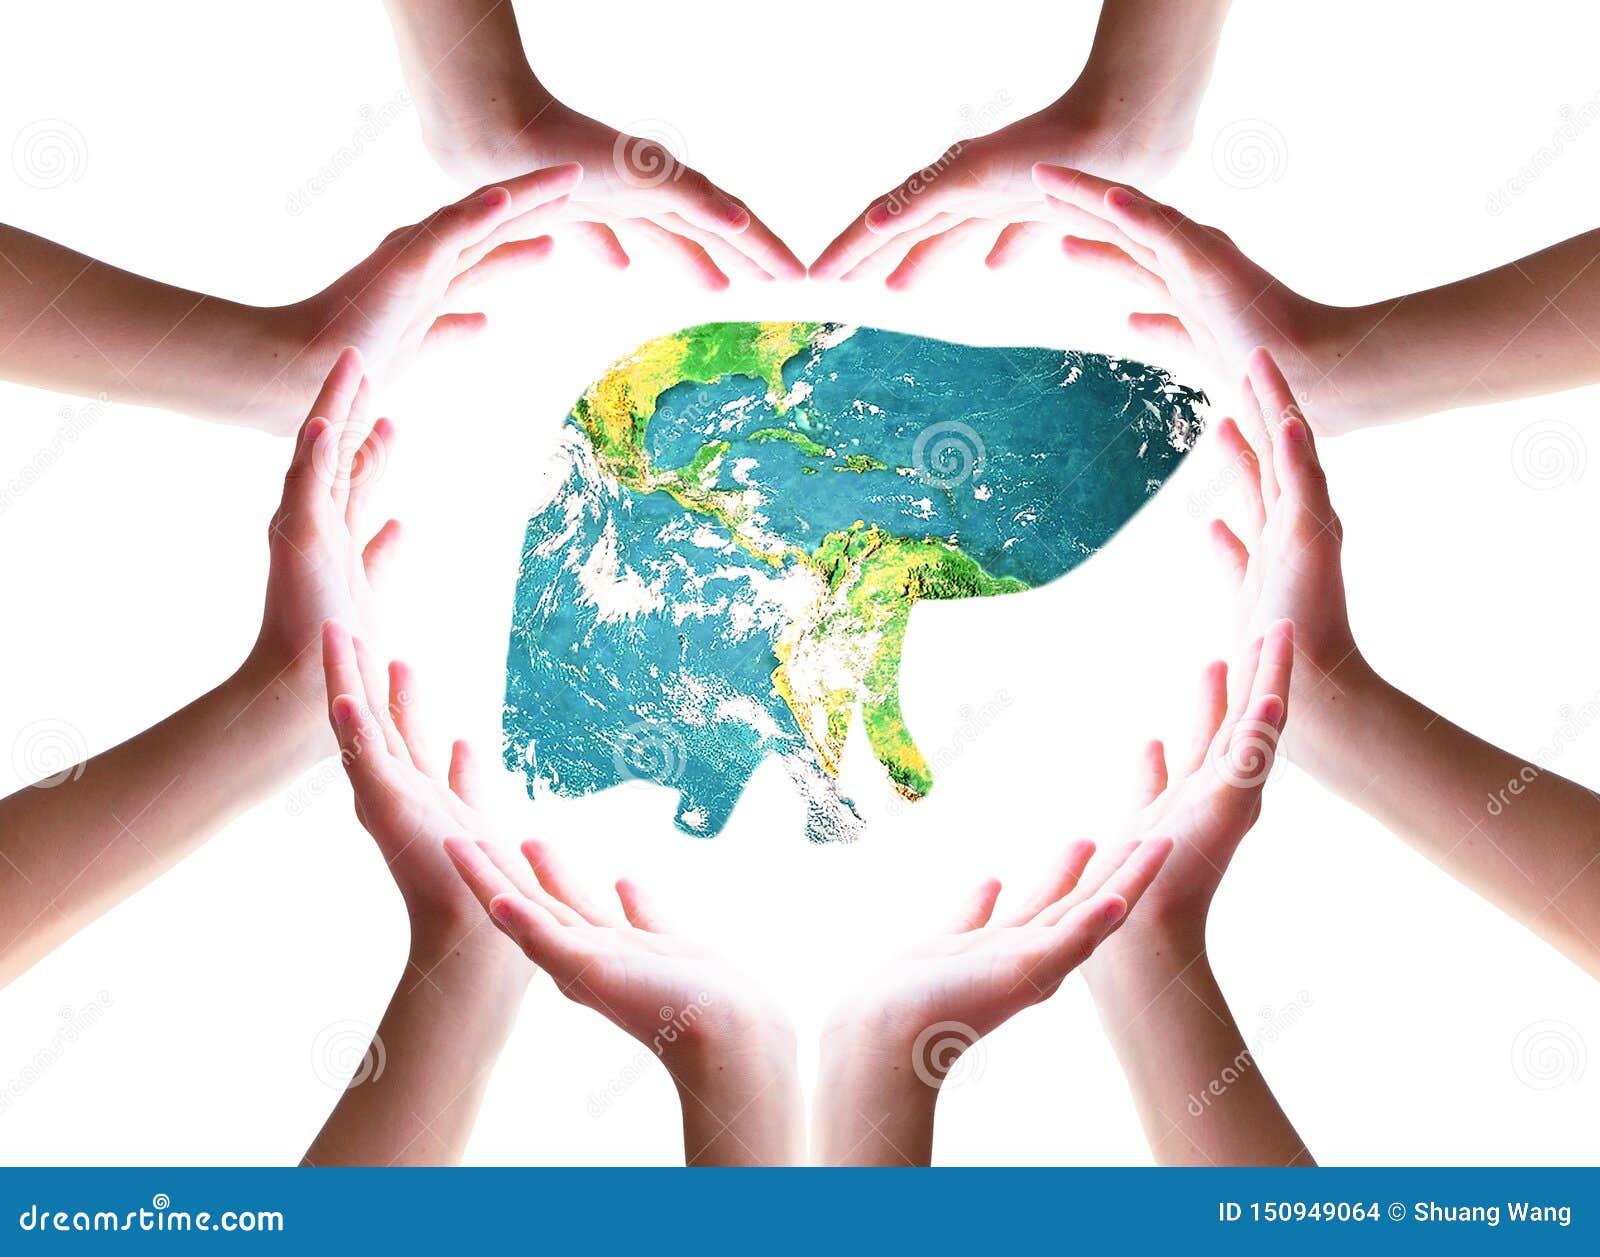 World Hepatitis Day concept: hand holding liver on white background